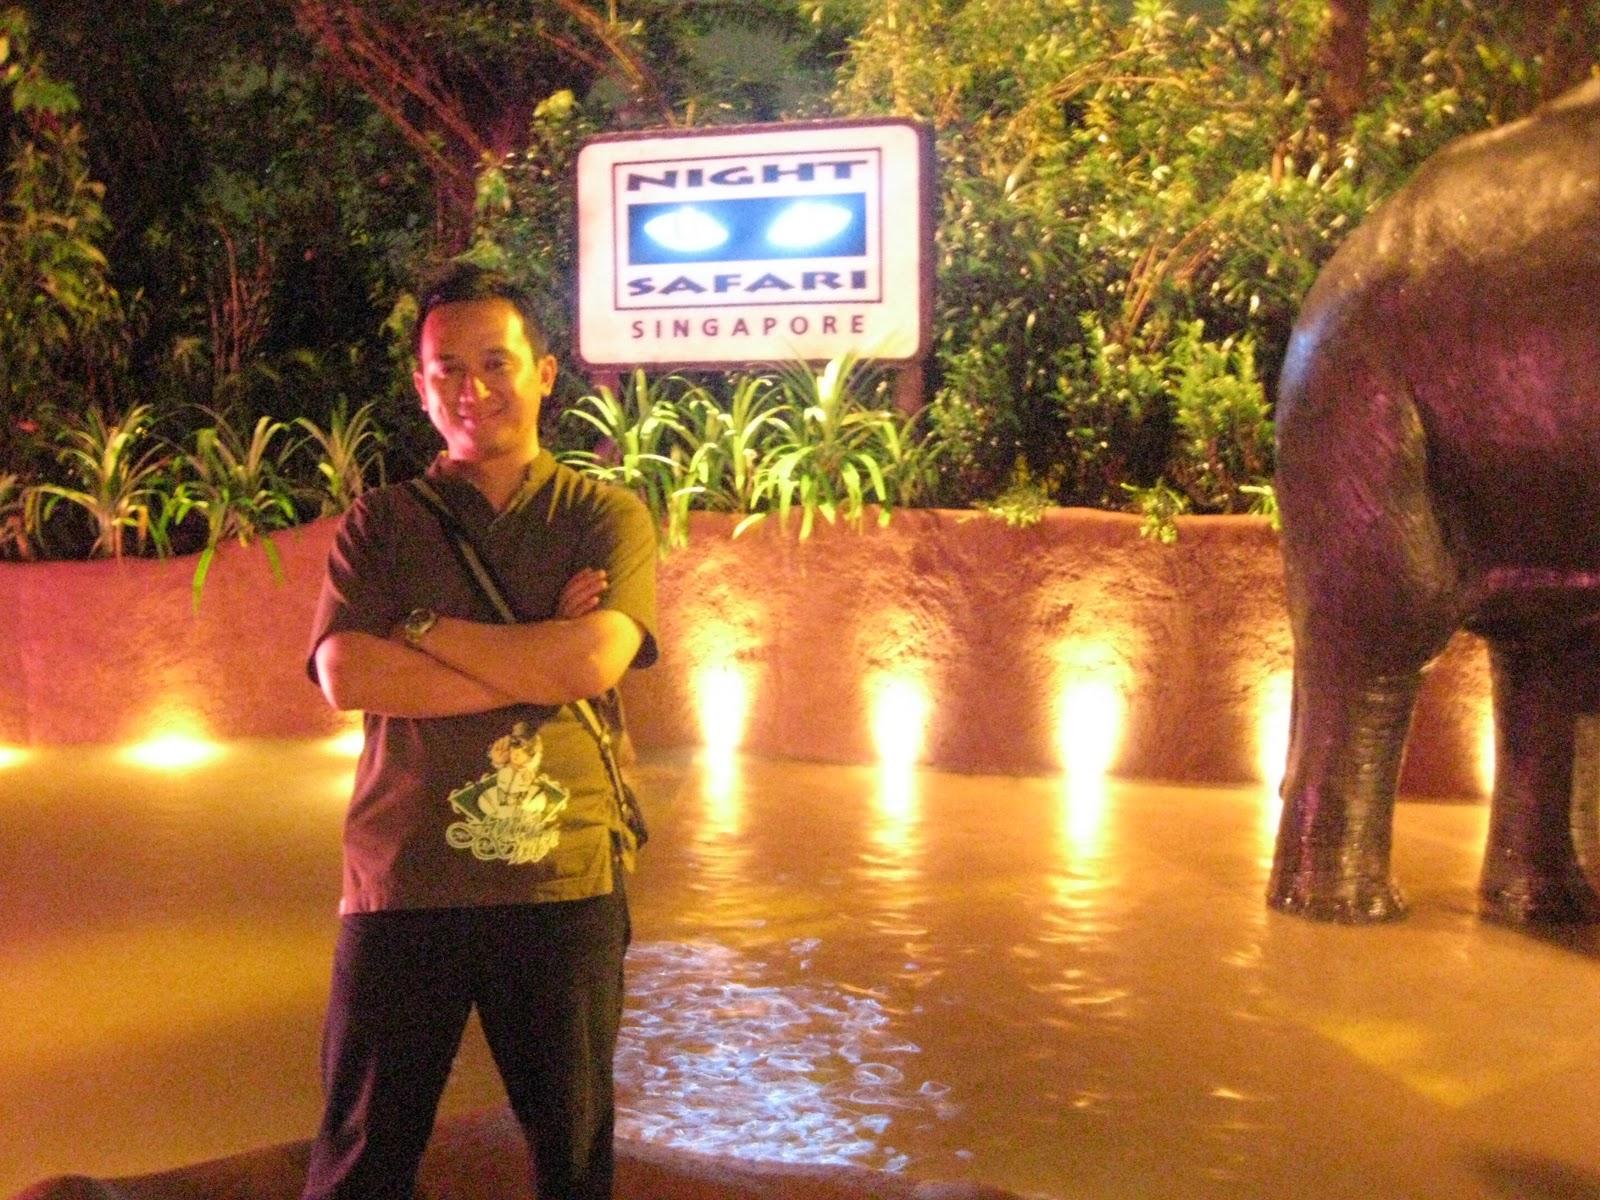 Mutiara Syafalaila 01 25 12 Singapore Et Ticket Night Safari Dewasa Tiket Terusan Zoo Dan Sgd30 Sgd15 Anak Beli Ke Di Sini Jam Buka 0830 1800